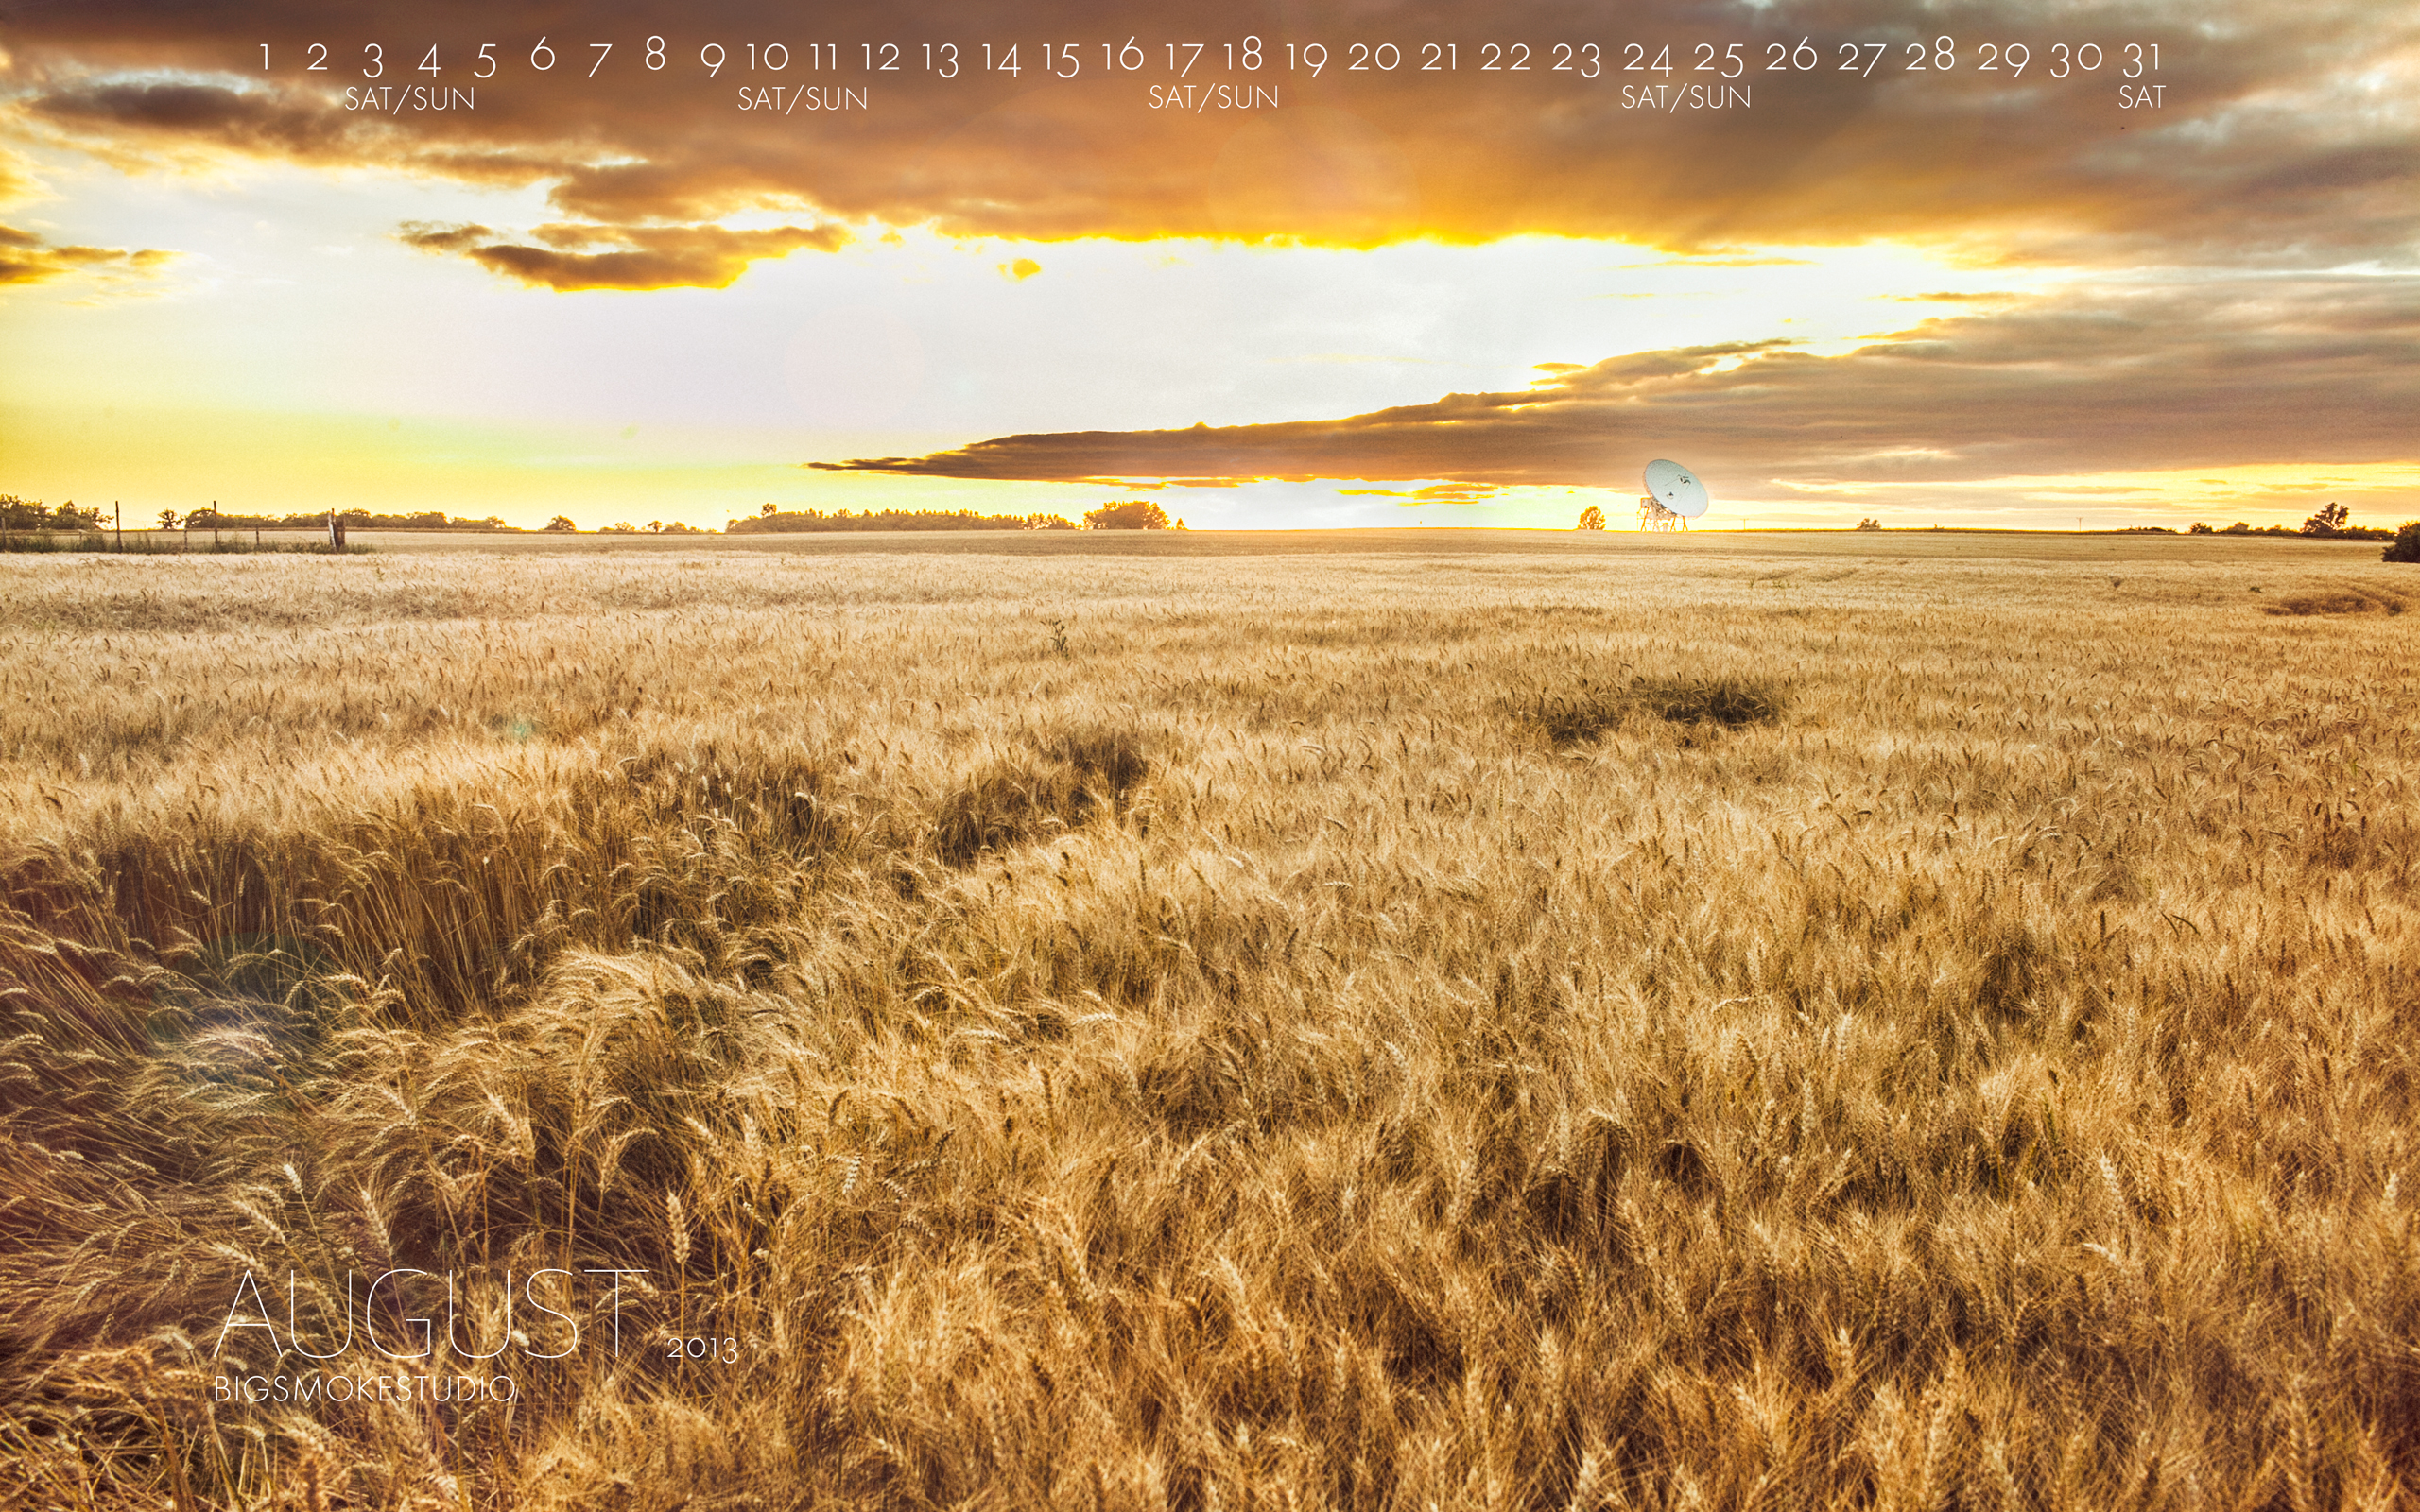 Piwnice_August_Calendar_2560x1600